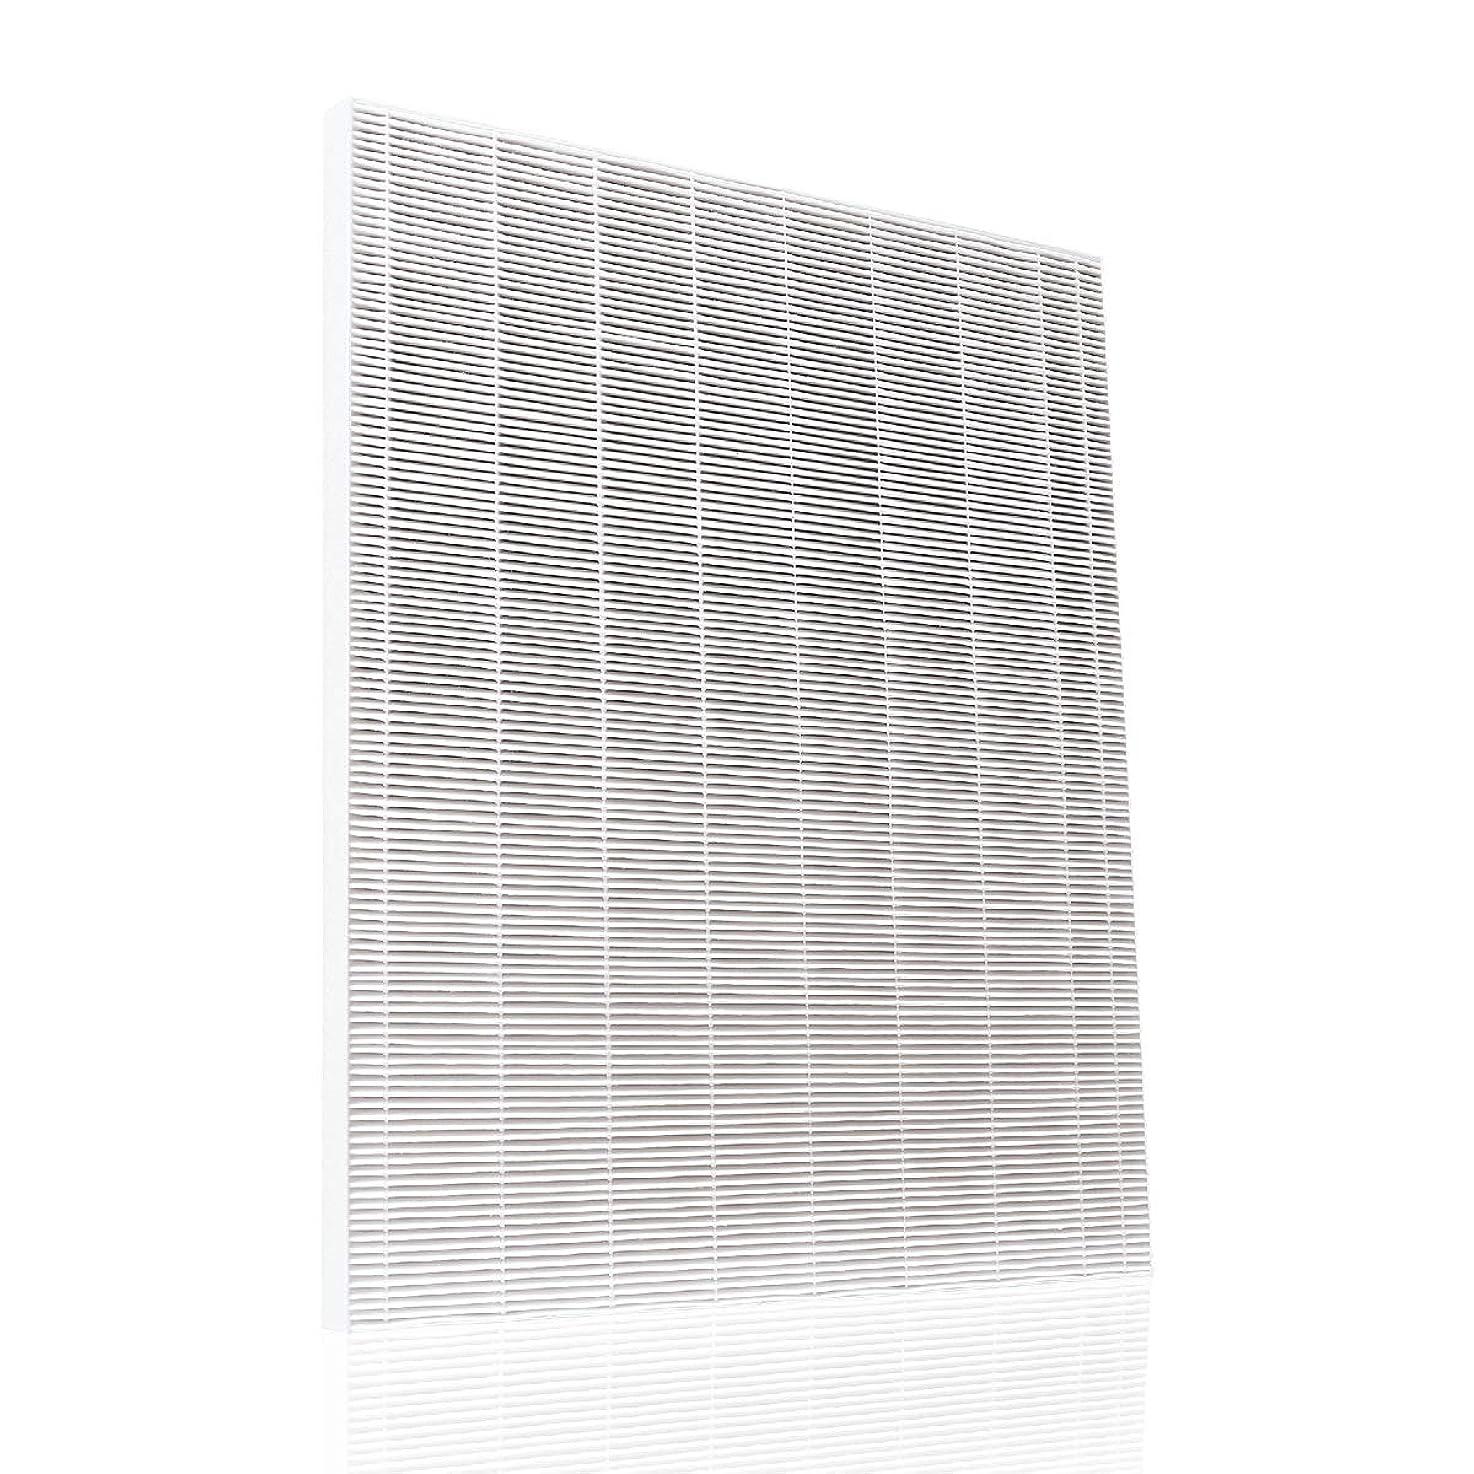 Kenmore Replacement HEPA filter 83187